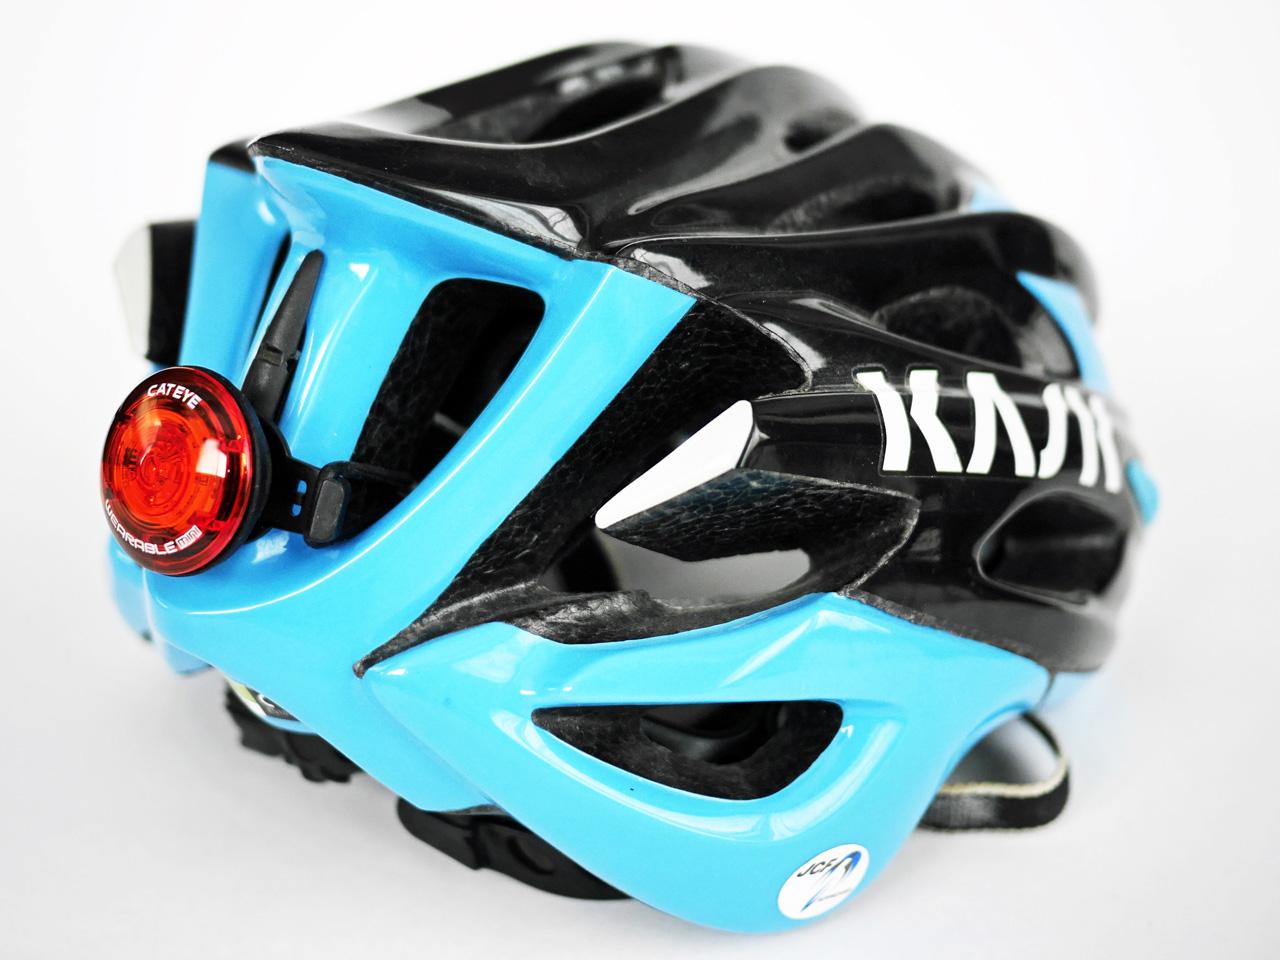 CATEYE WEARABLE MINI をヘルメット KASK MOJITO に装着